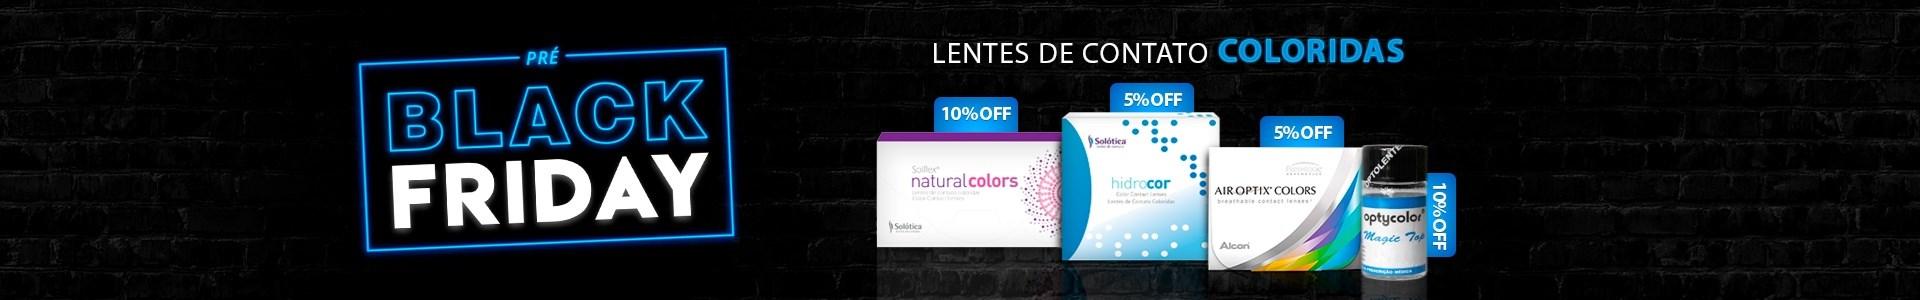 Pre Black Friday NewLentes - Lentes coloridas